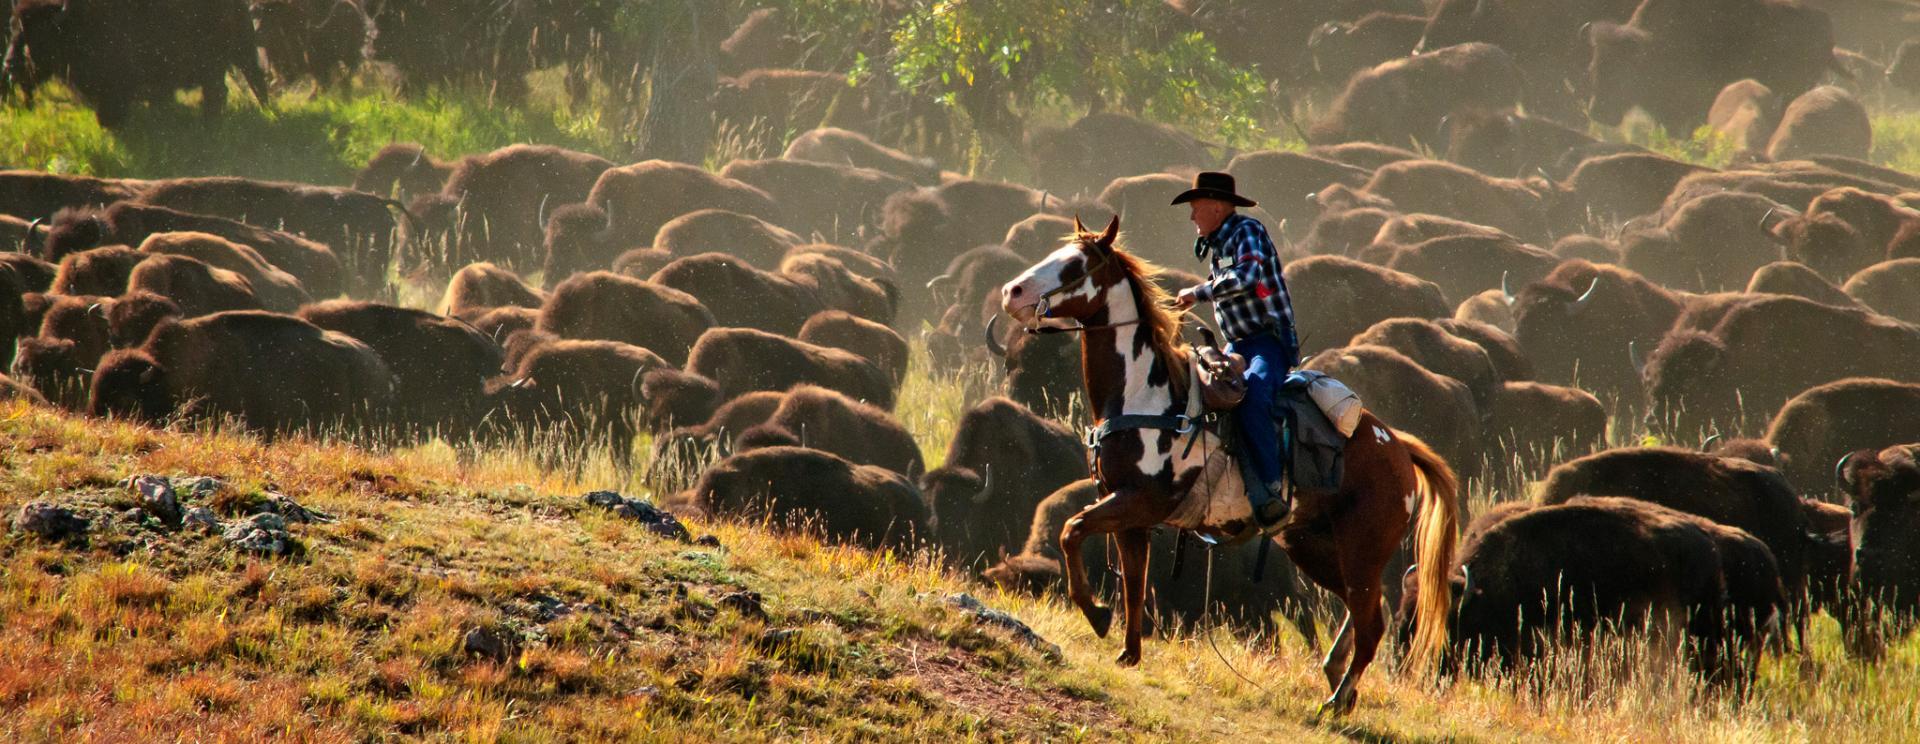 Custer State Park Buffalo Roundup & Arts Festival